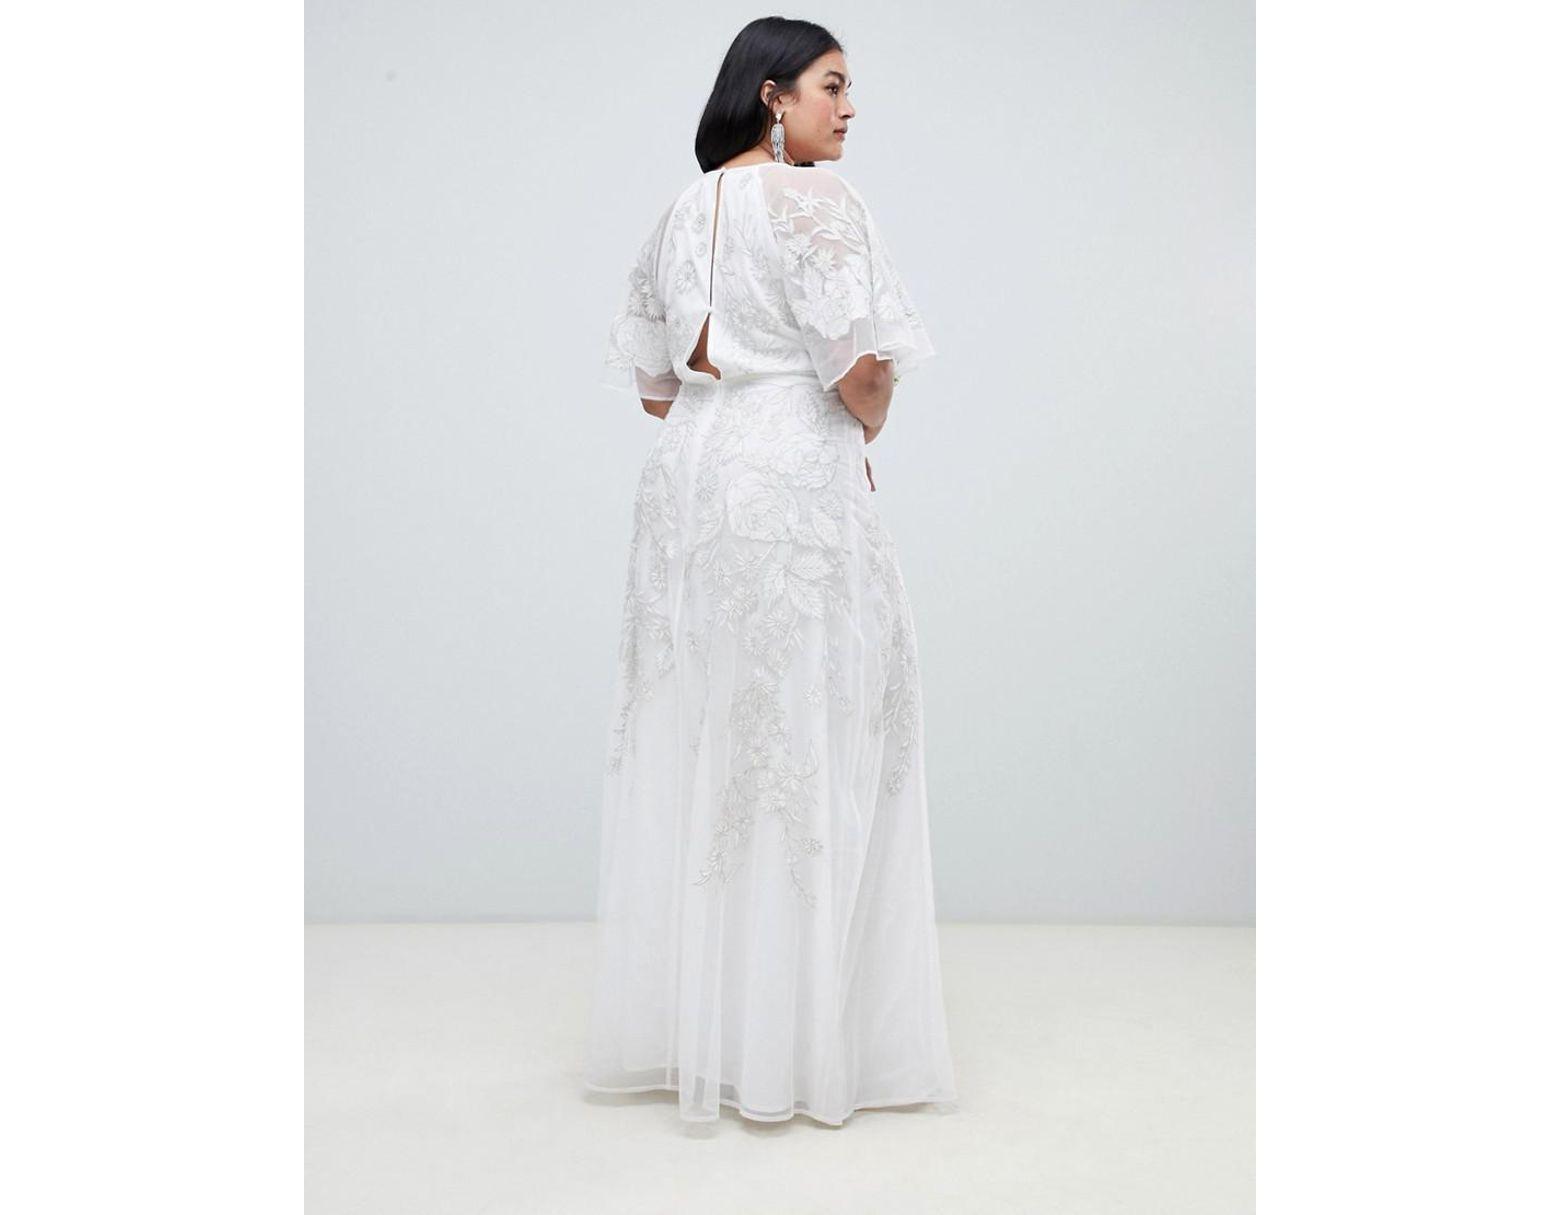 e270354138c599 ASOS Asos Edition Curve Floral Applique Wedding Dress in White - Lyst